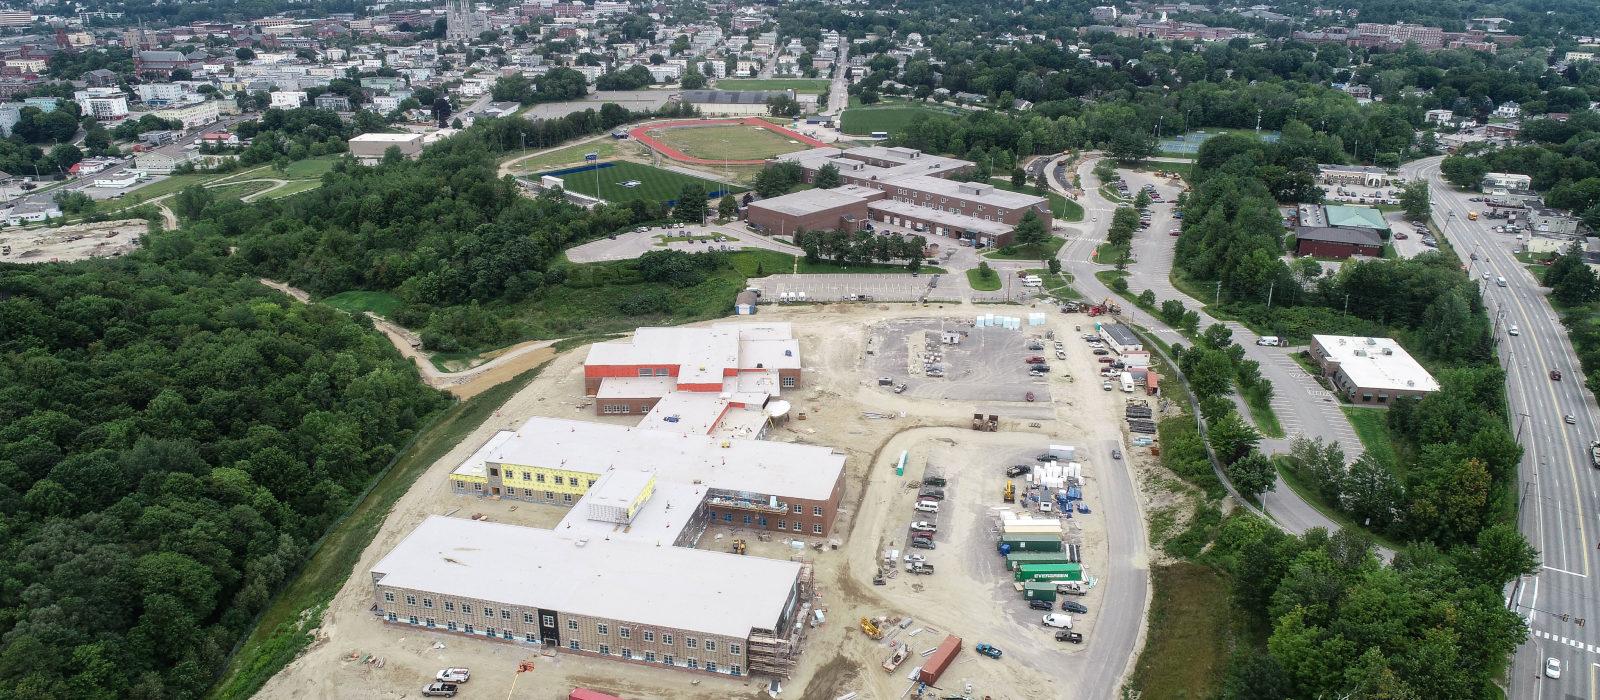 Lewiston Public School Aerial View